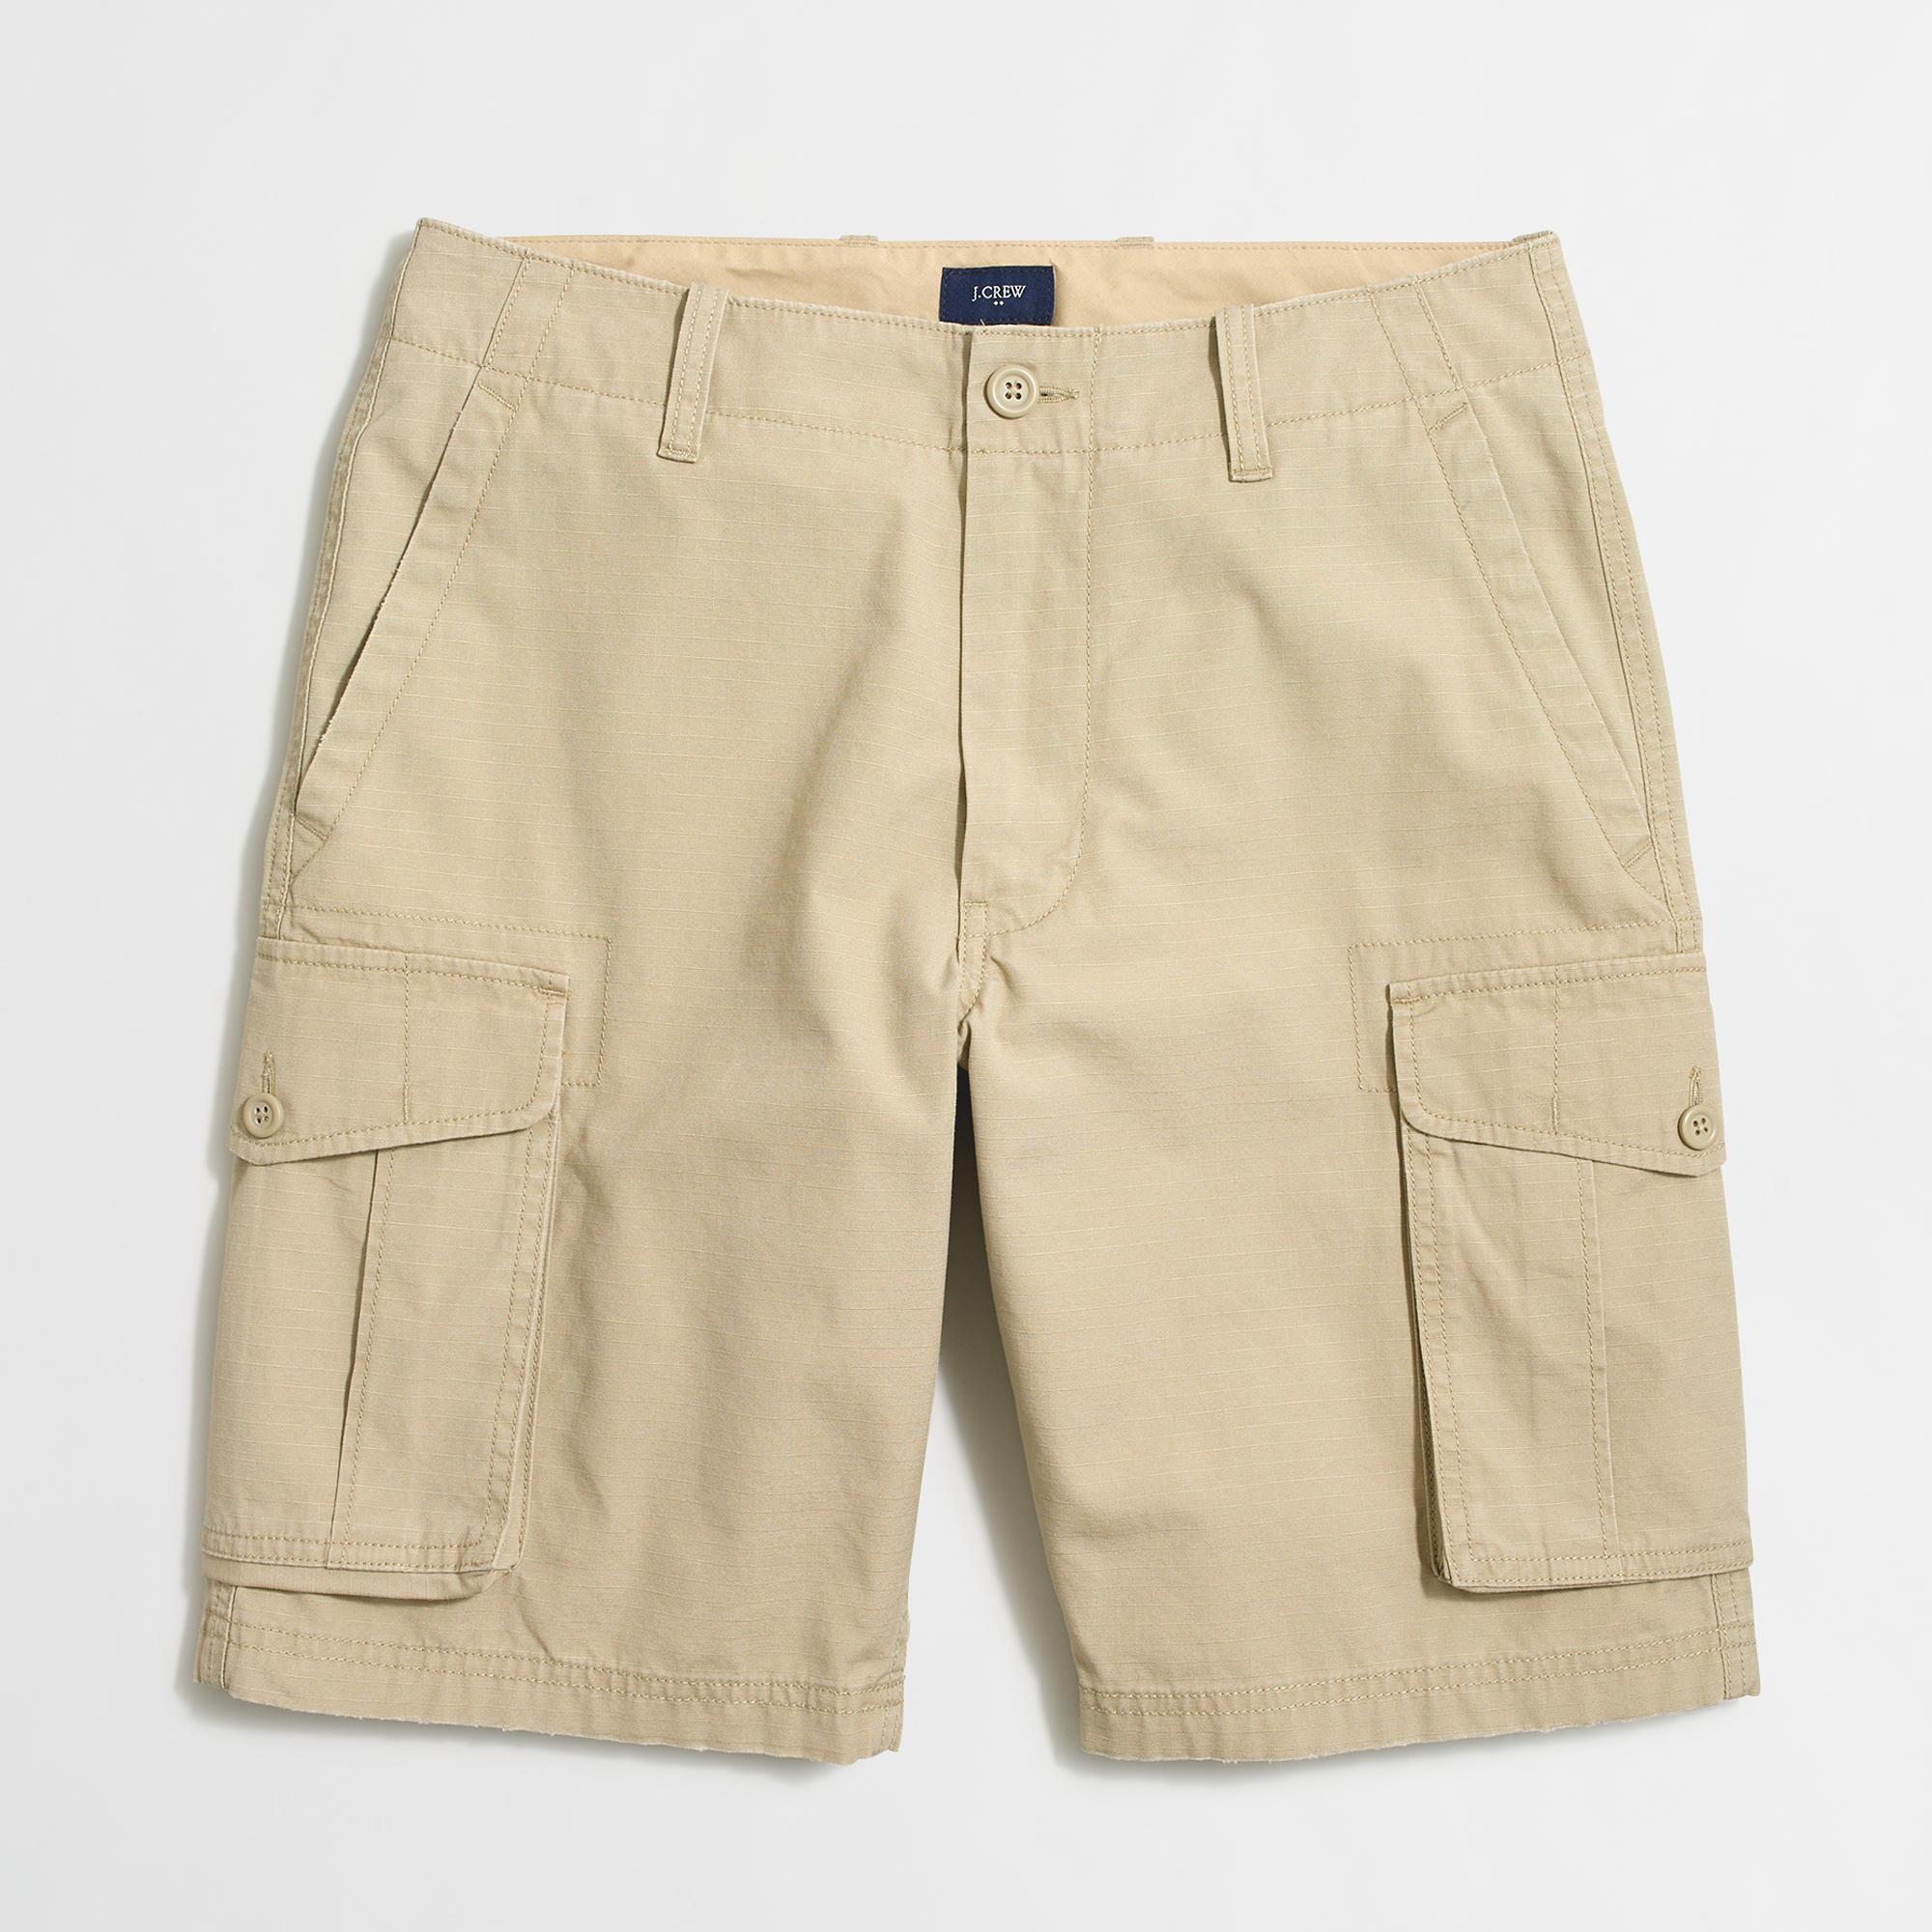 Factory Men's Cargo Shorts $9.99 AC + FS @ J. Crew Factory